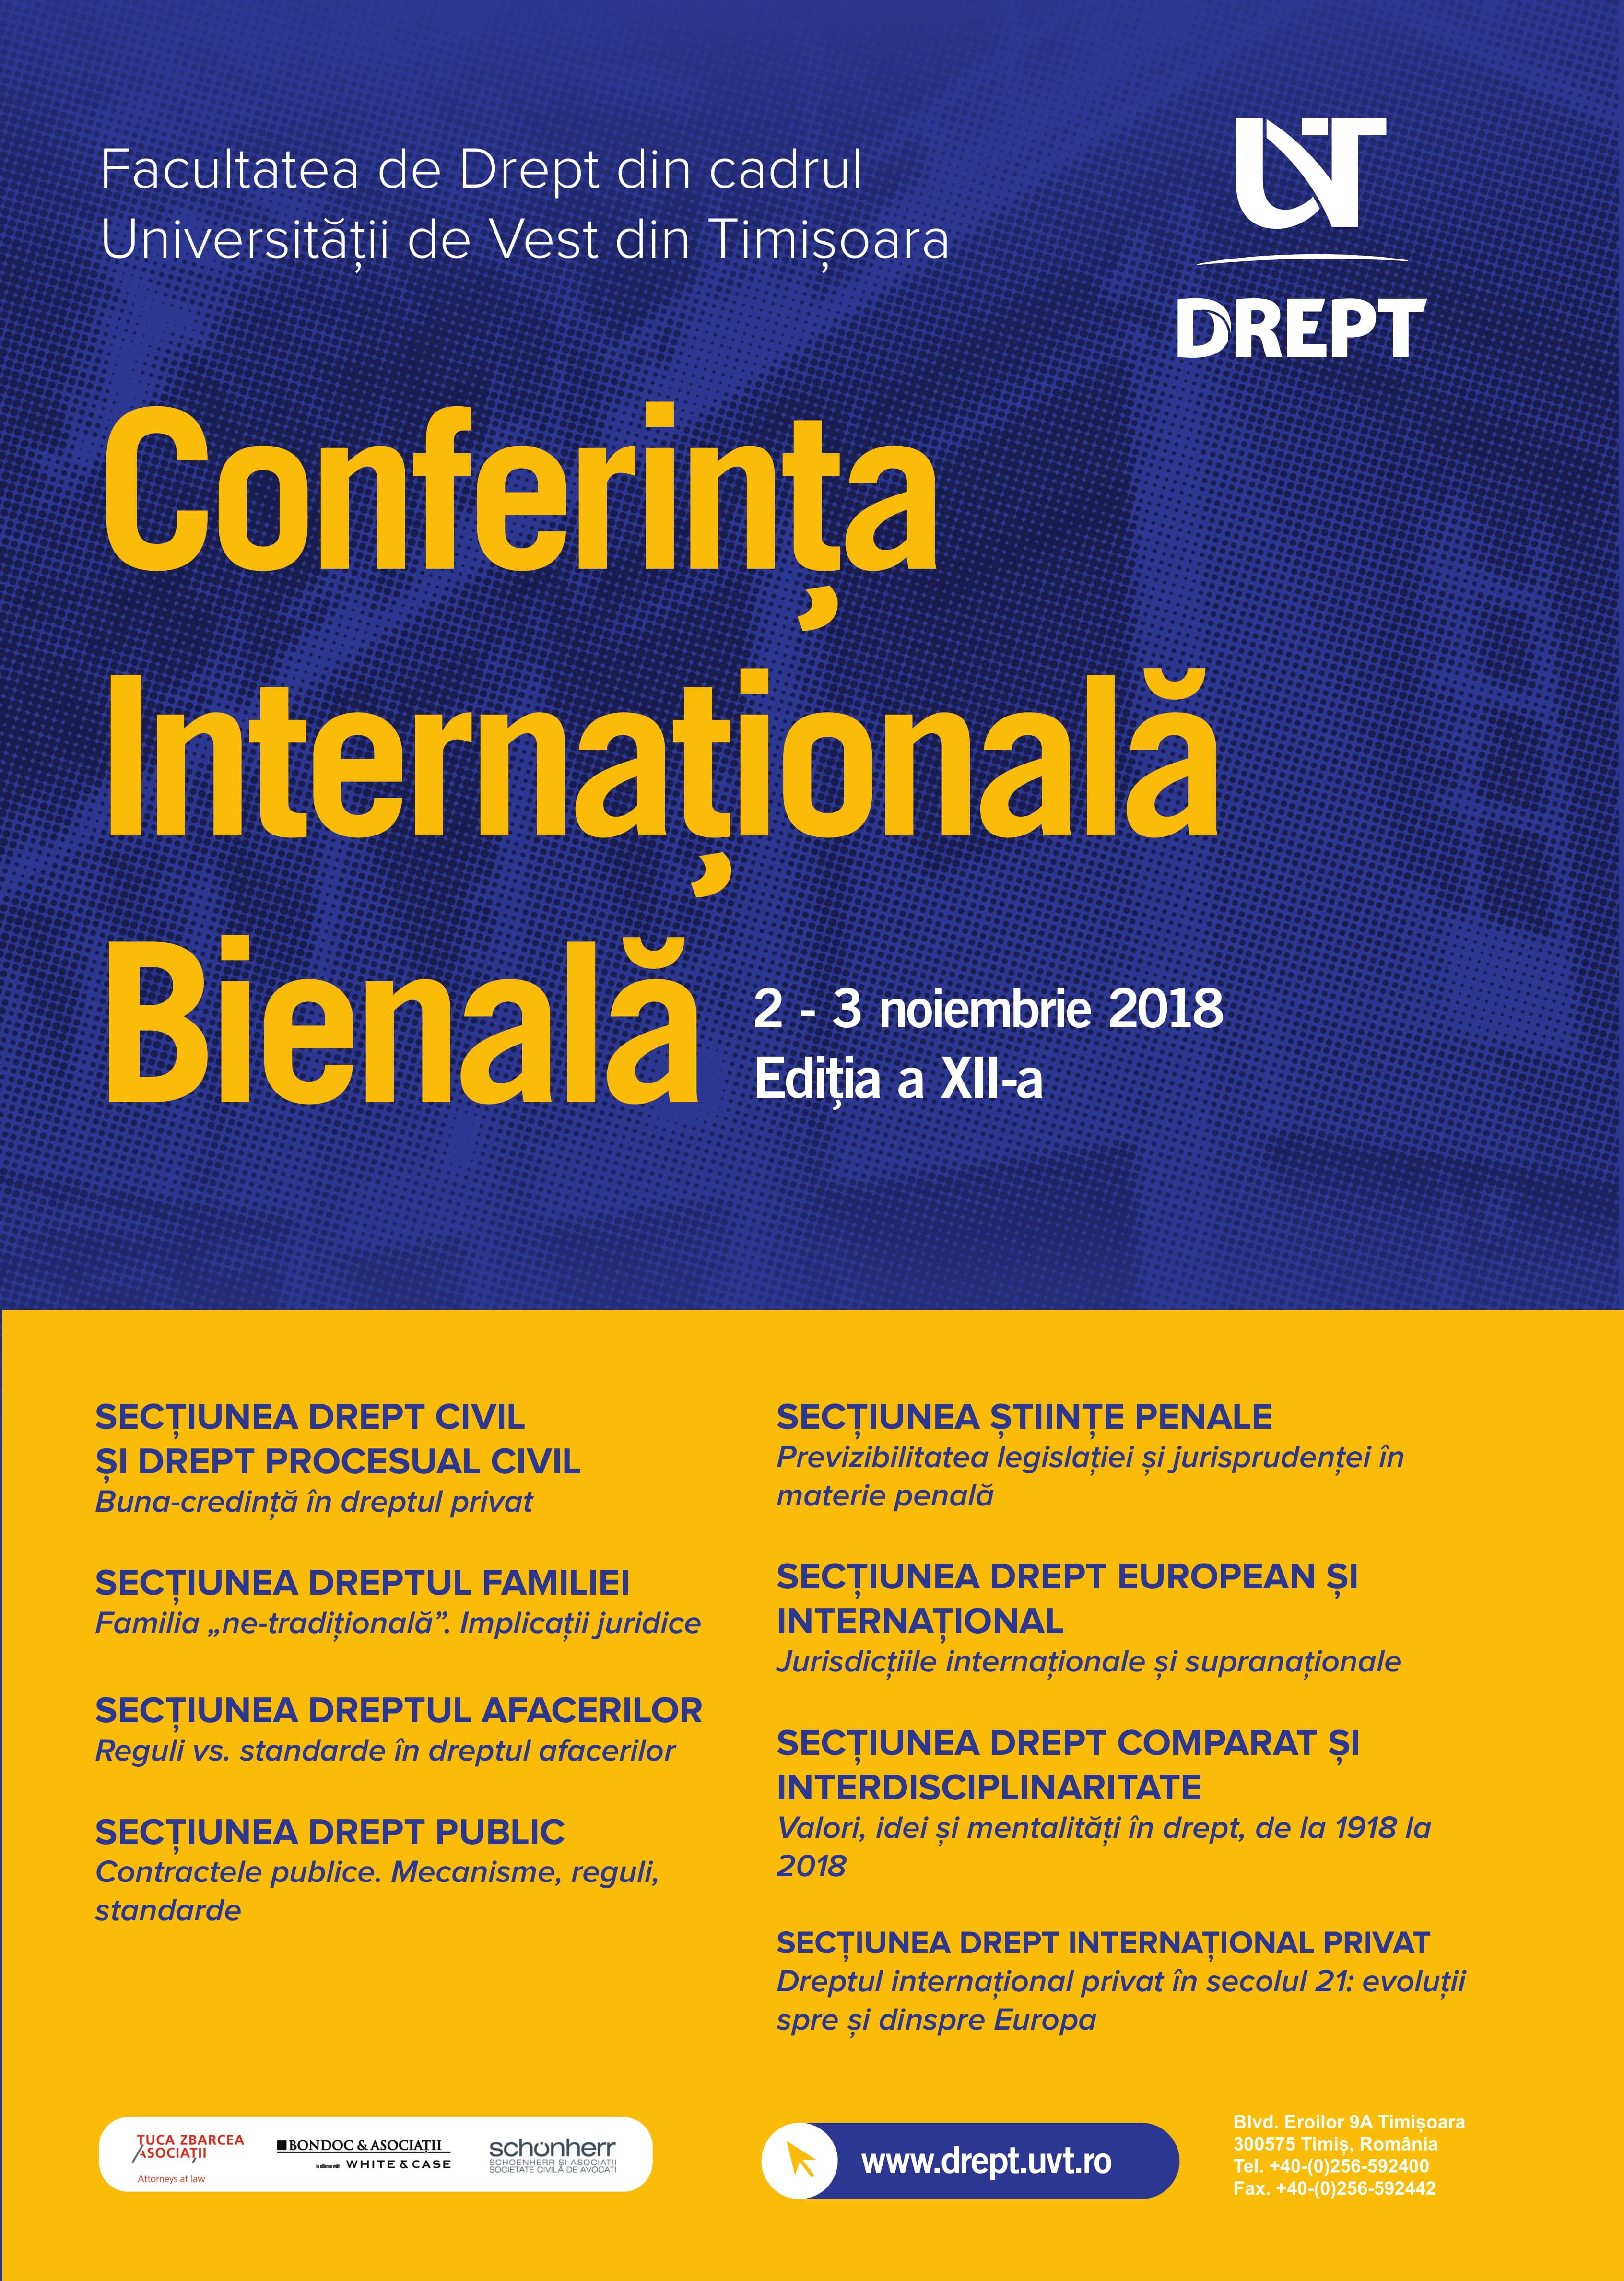 DREPT UVT Binenala 2018